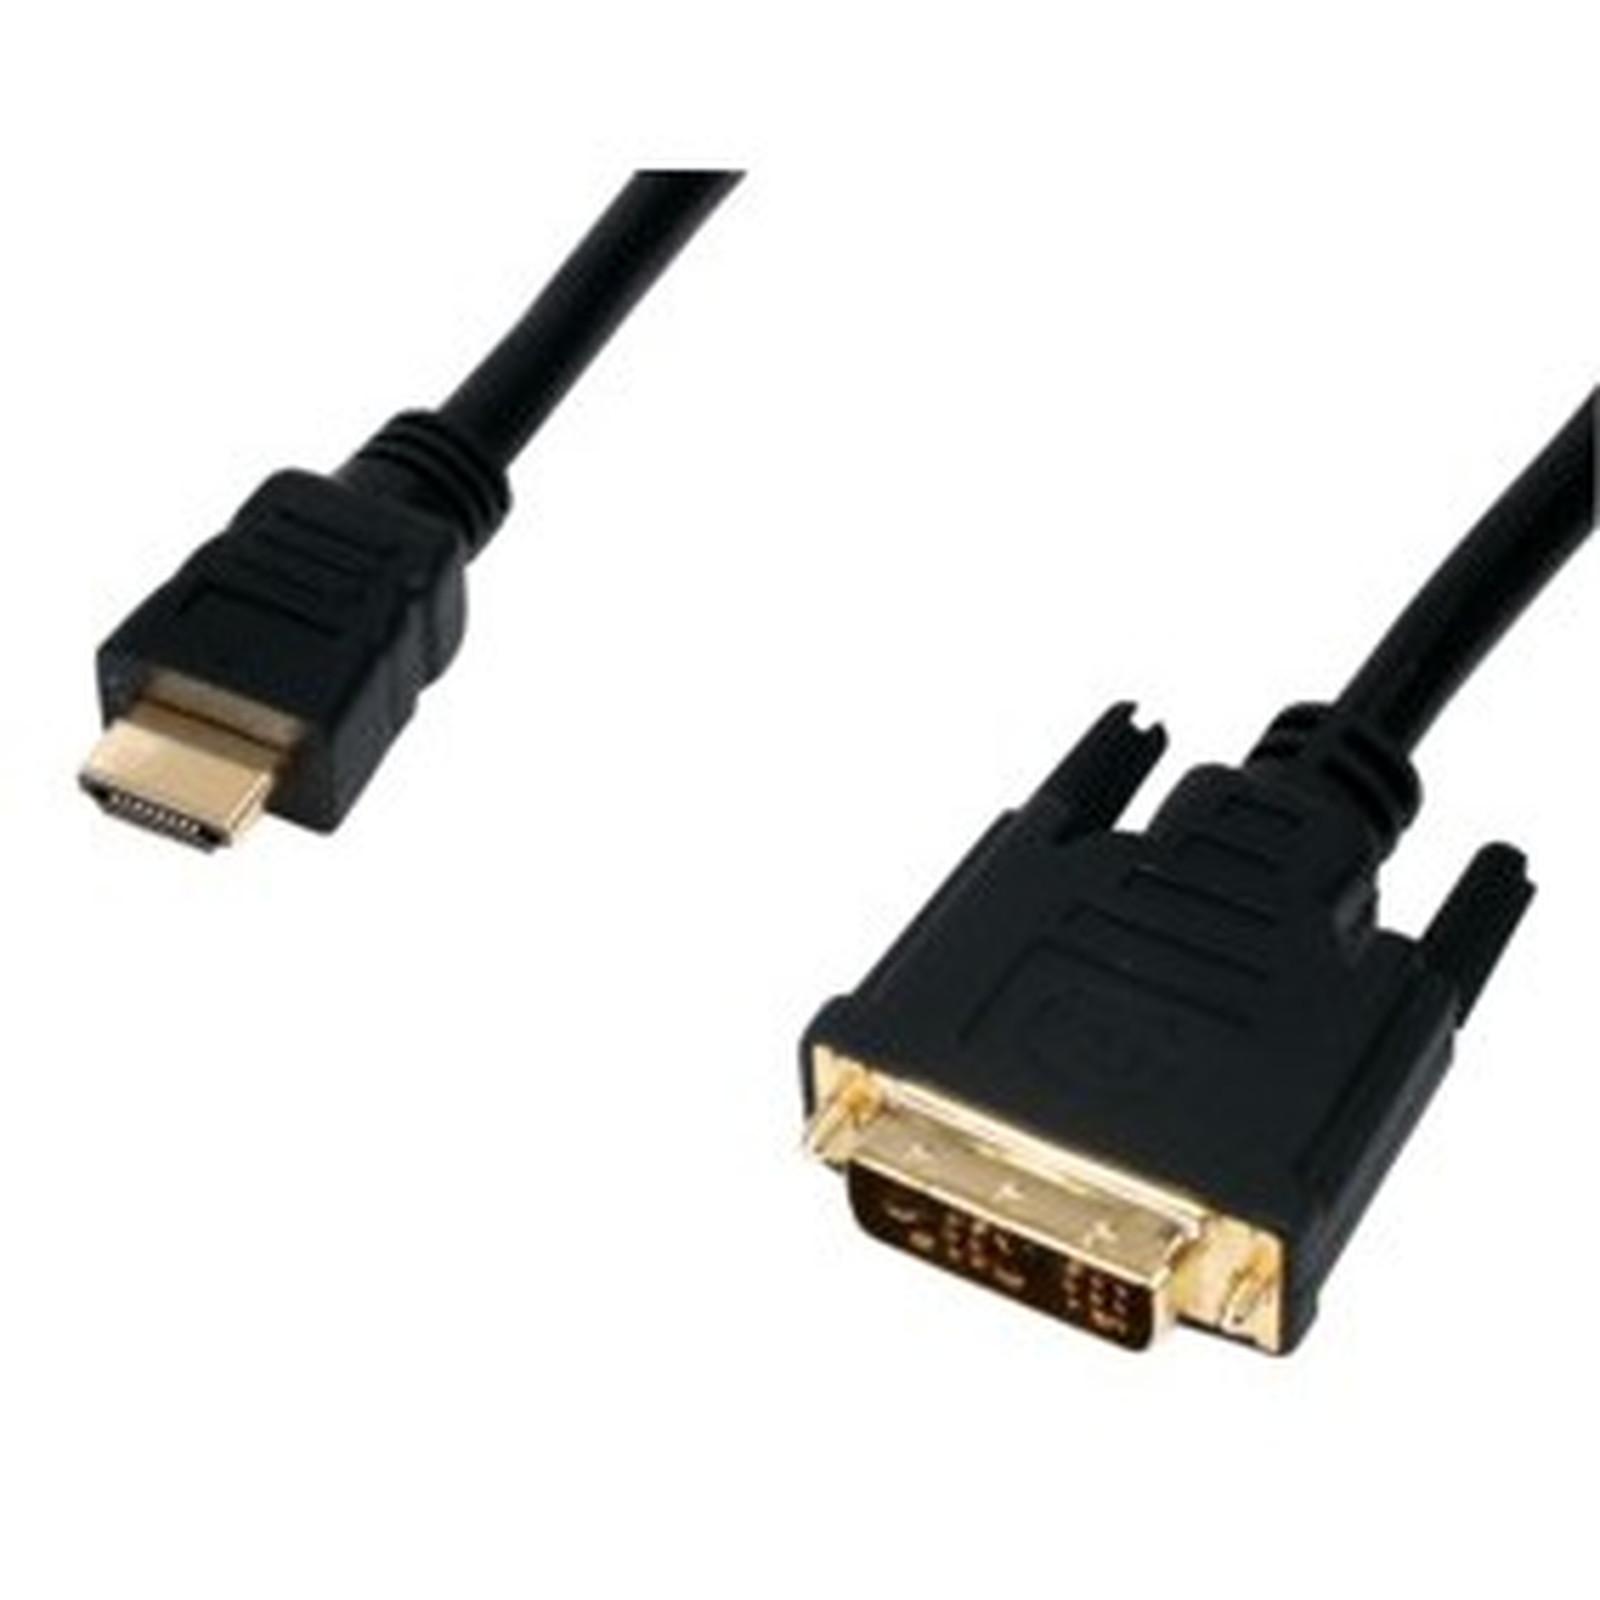 Câble DVI-D Single Link mâle / HDMI mâle (10 mètres) plaqué or